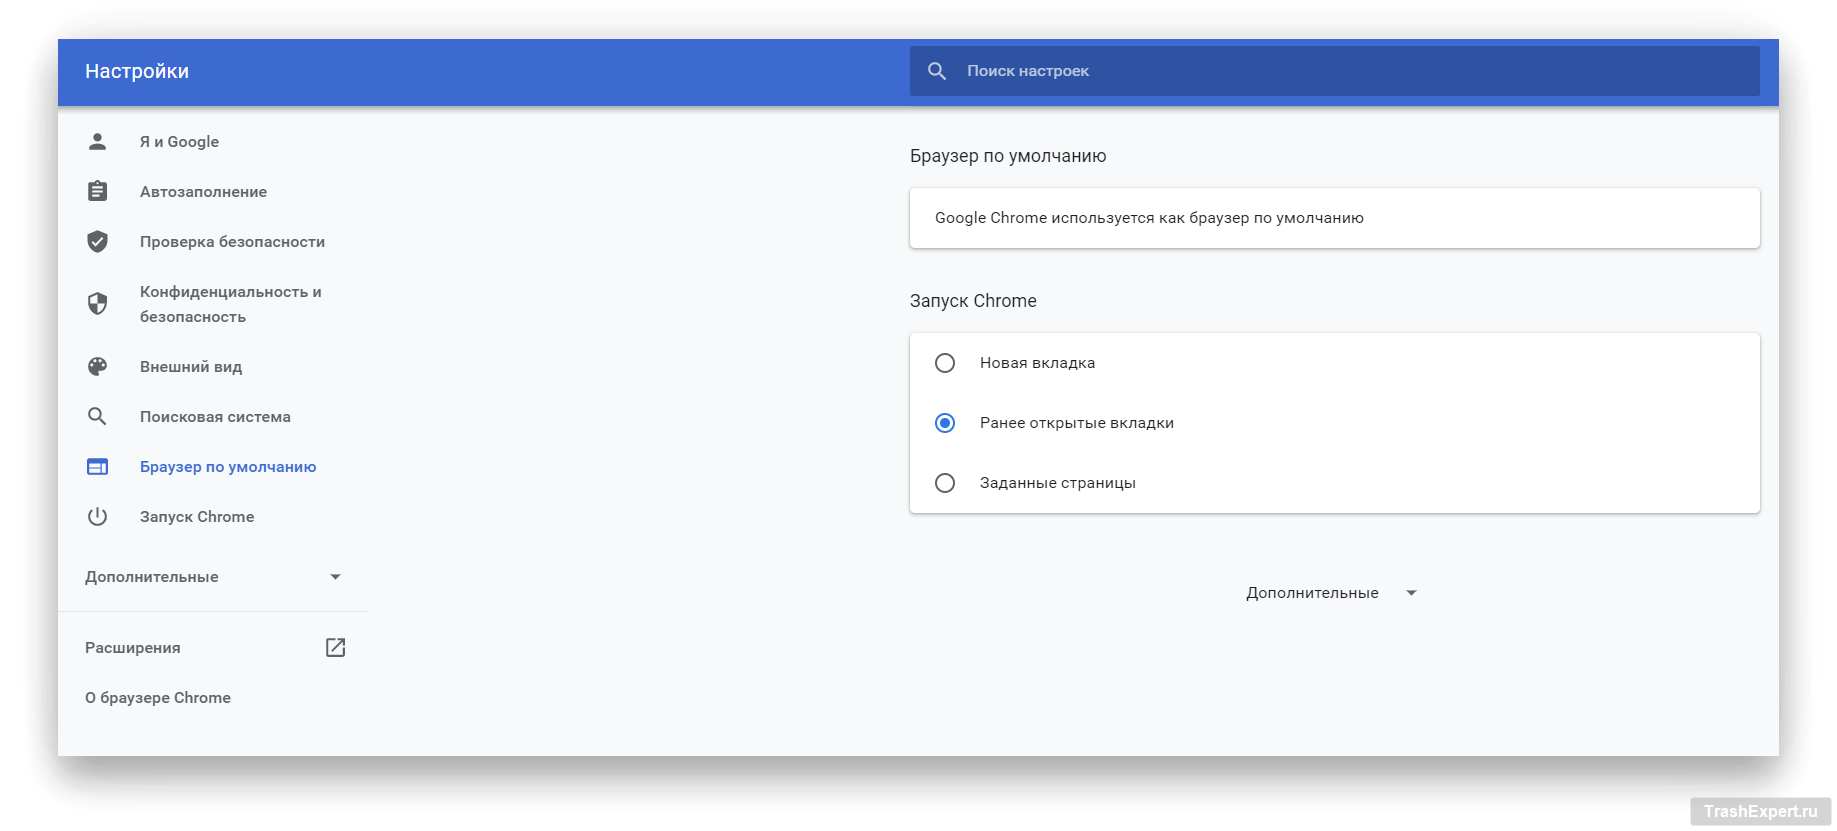 Браузер по умолчанию в Google Chrome